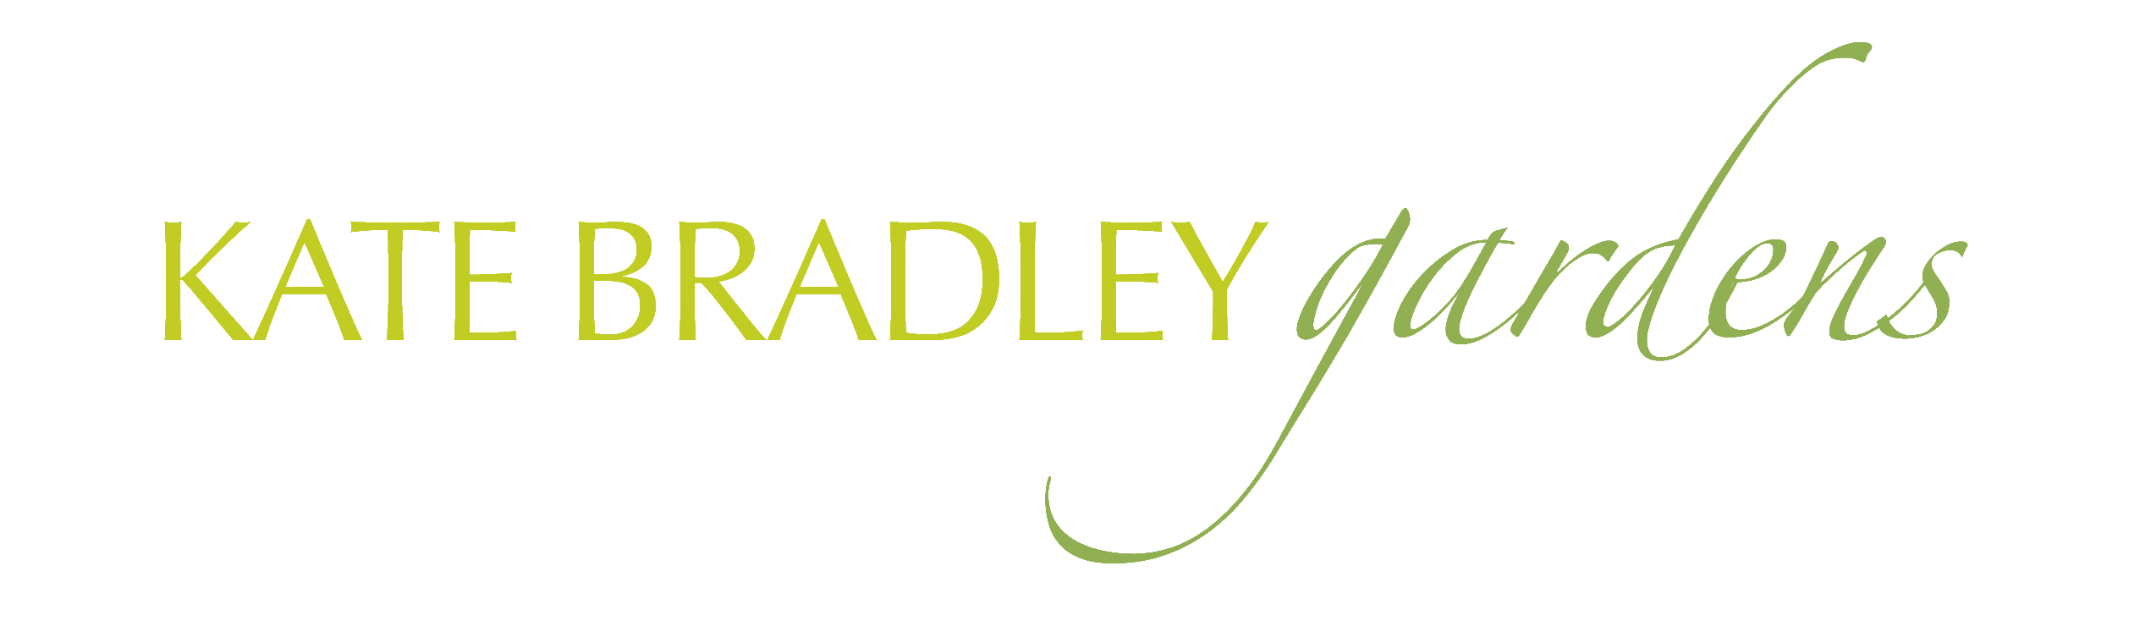 Kate Bradley Gardens